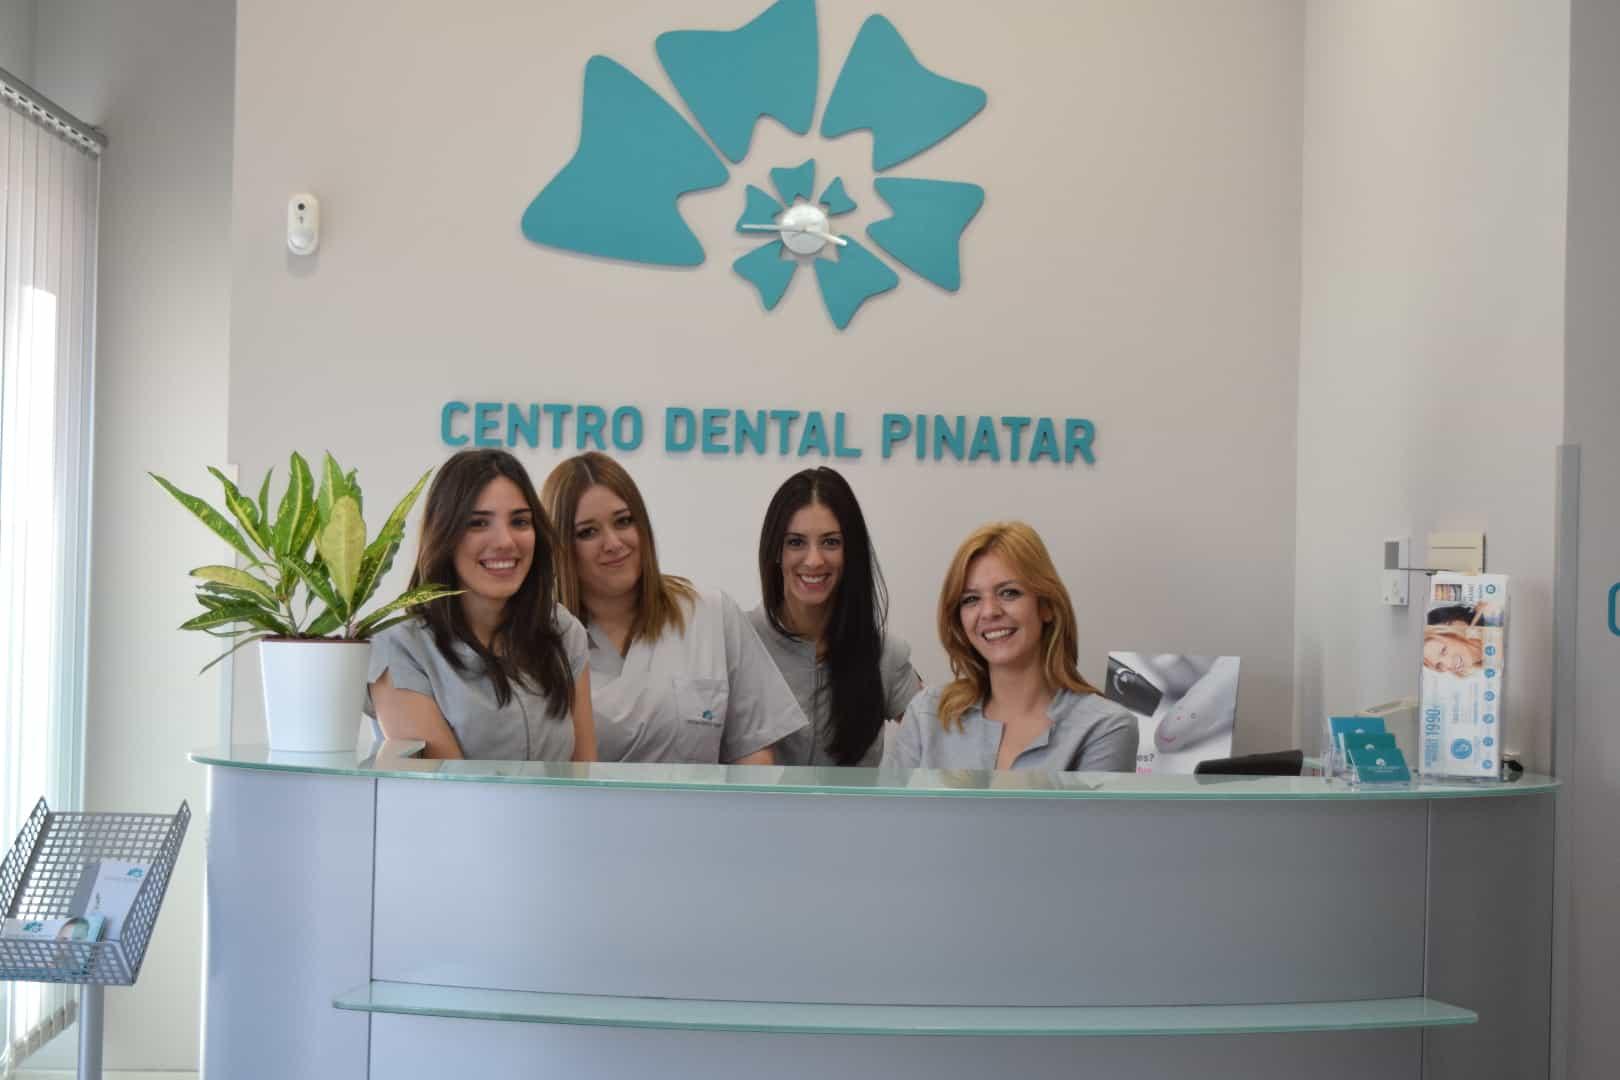 Centro Dental Pinatar - Equipo